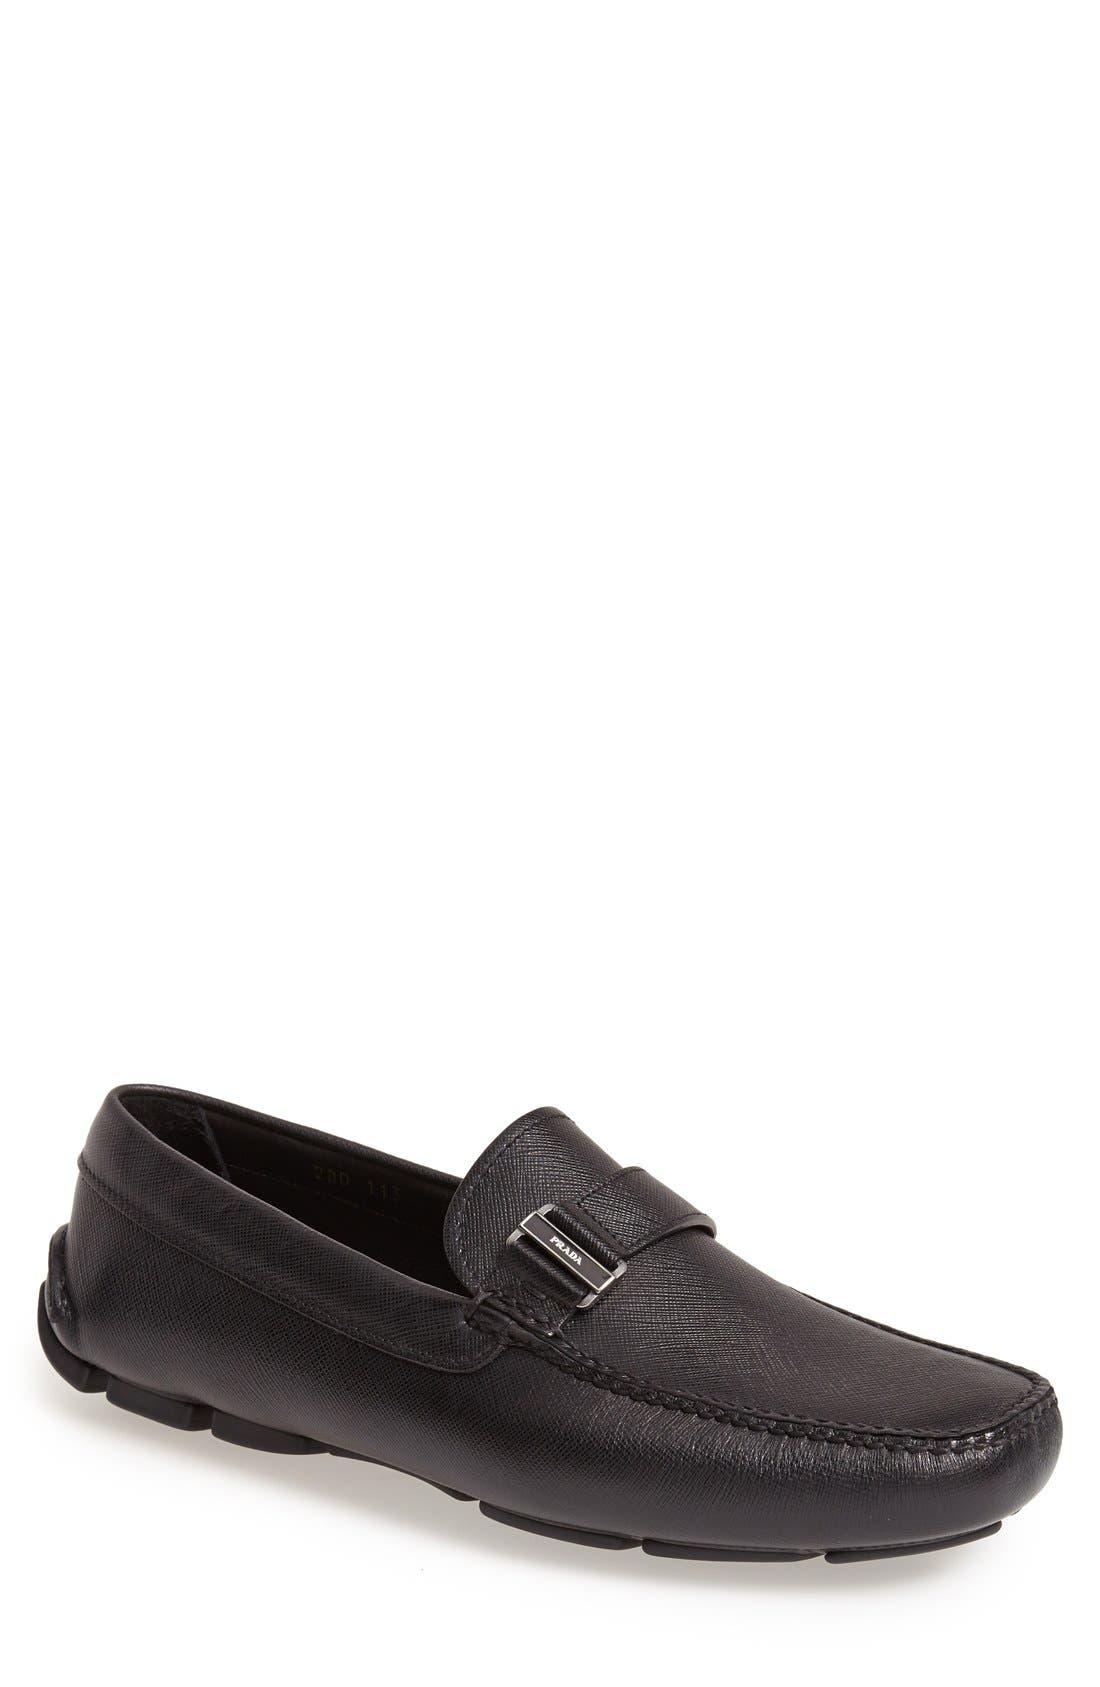 Alternate Image 1 Selected - Prada Saffiano Leather Driving Shoe (Men)